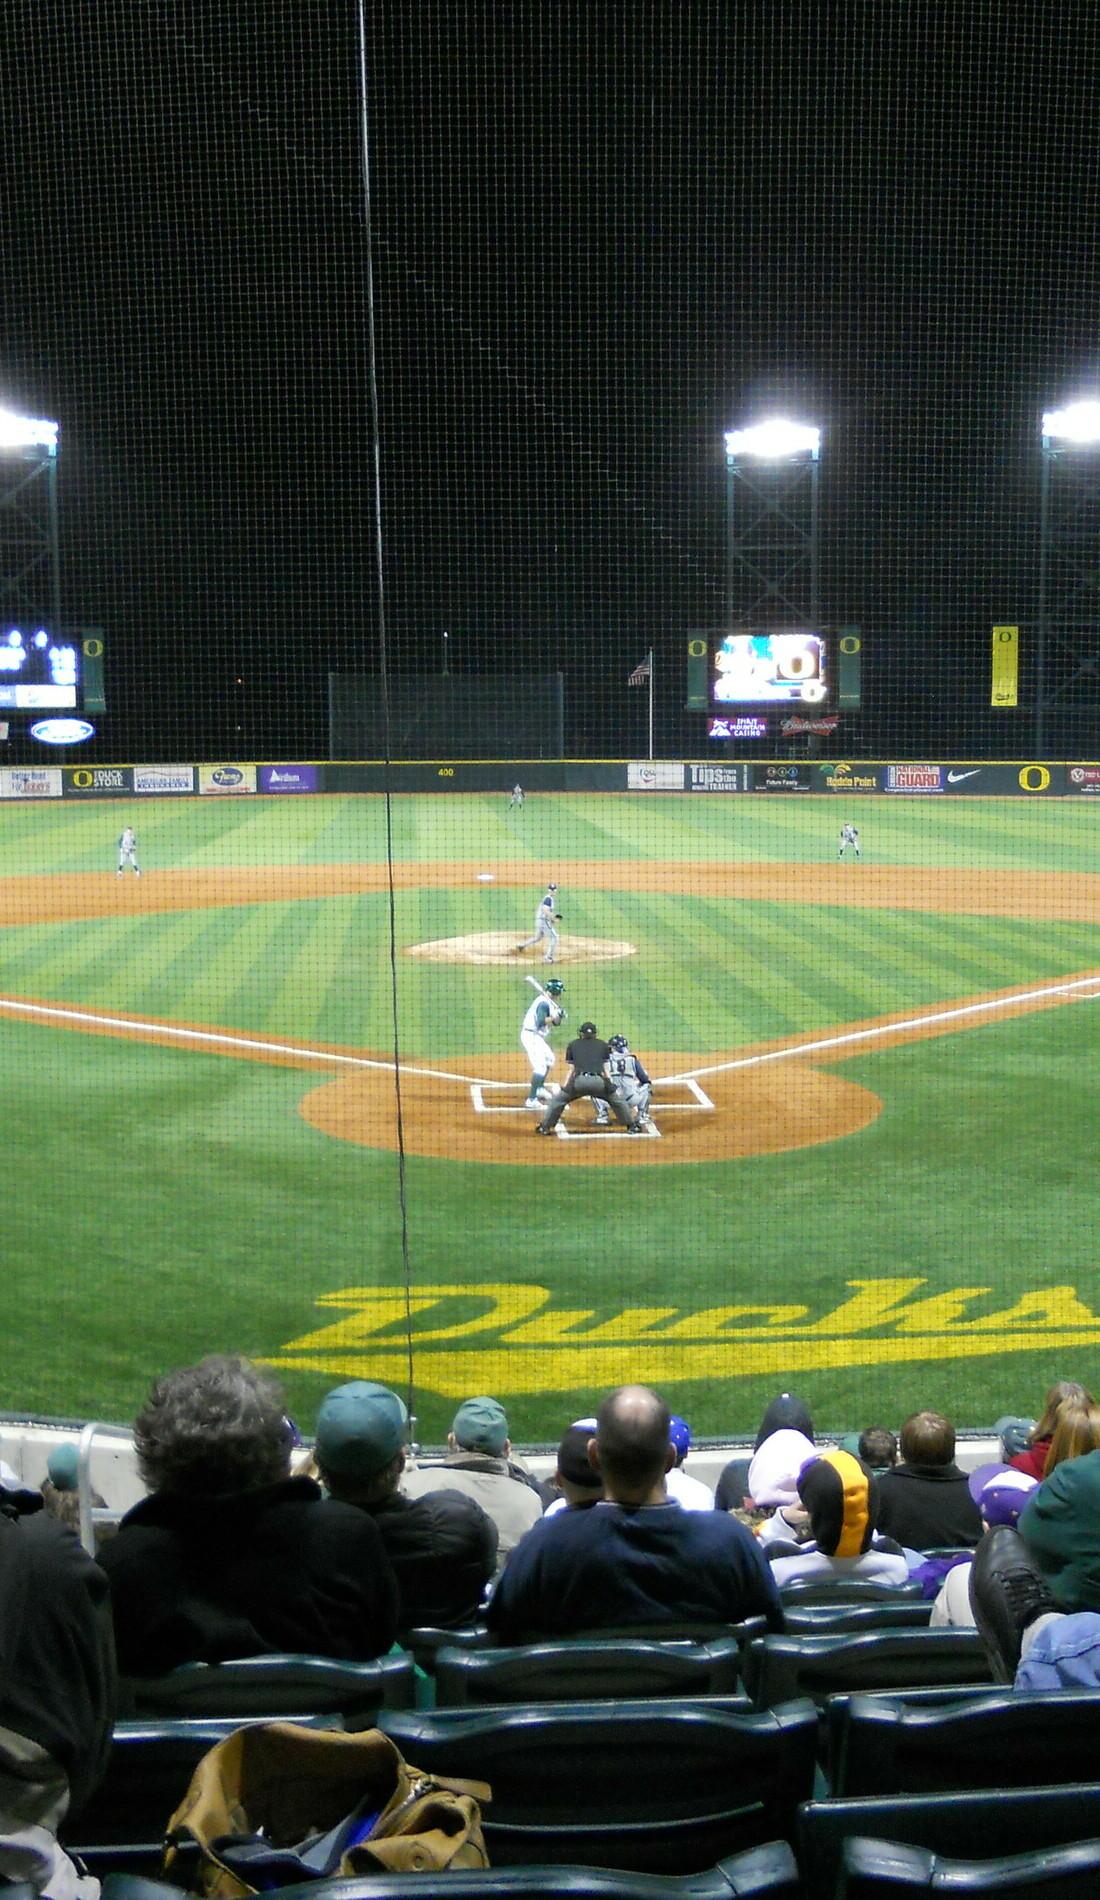 A Oregon Ducks Baseball live event